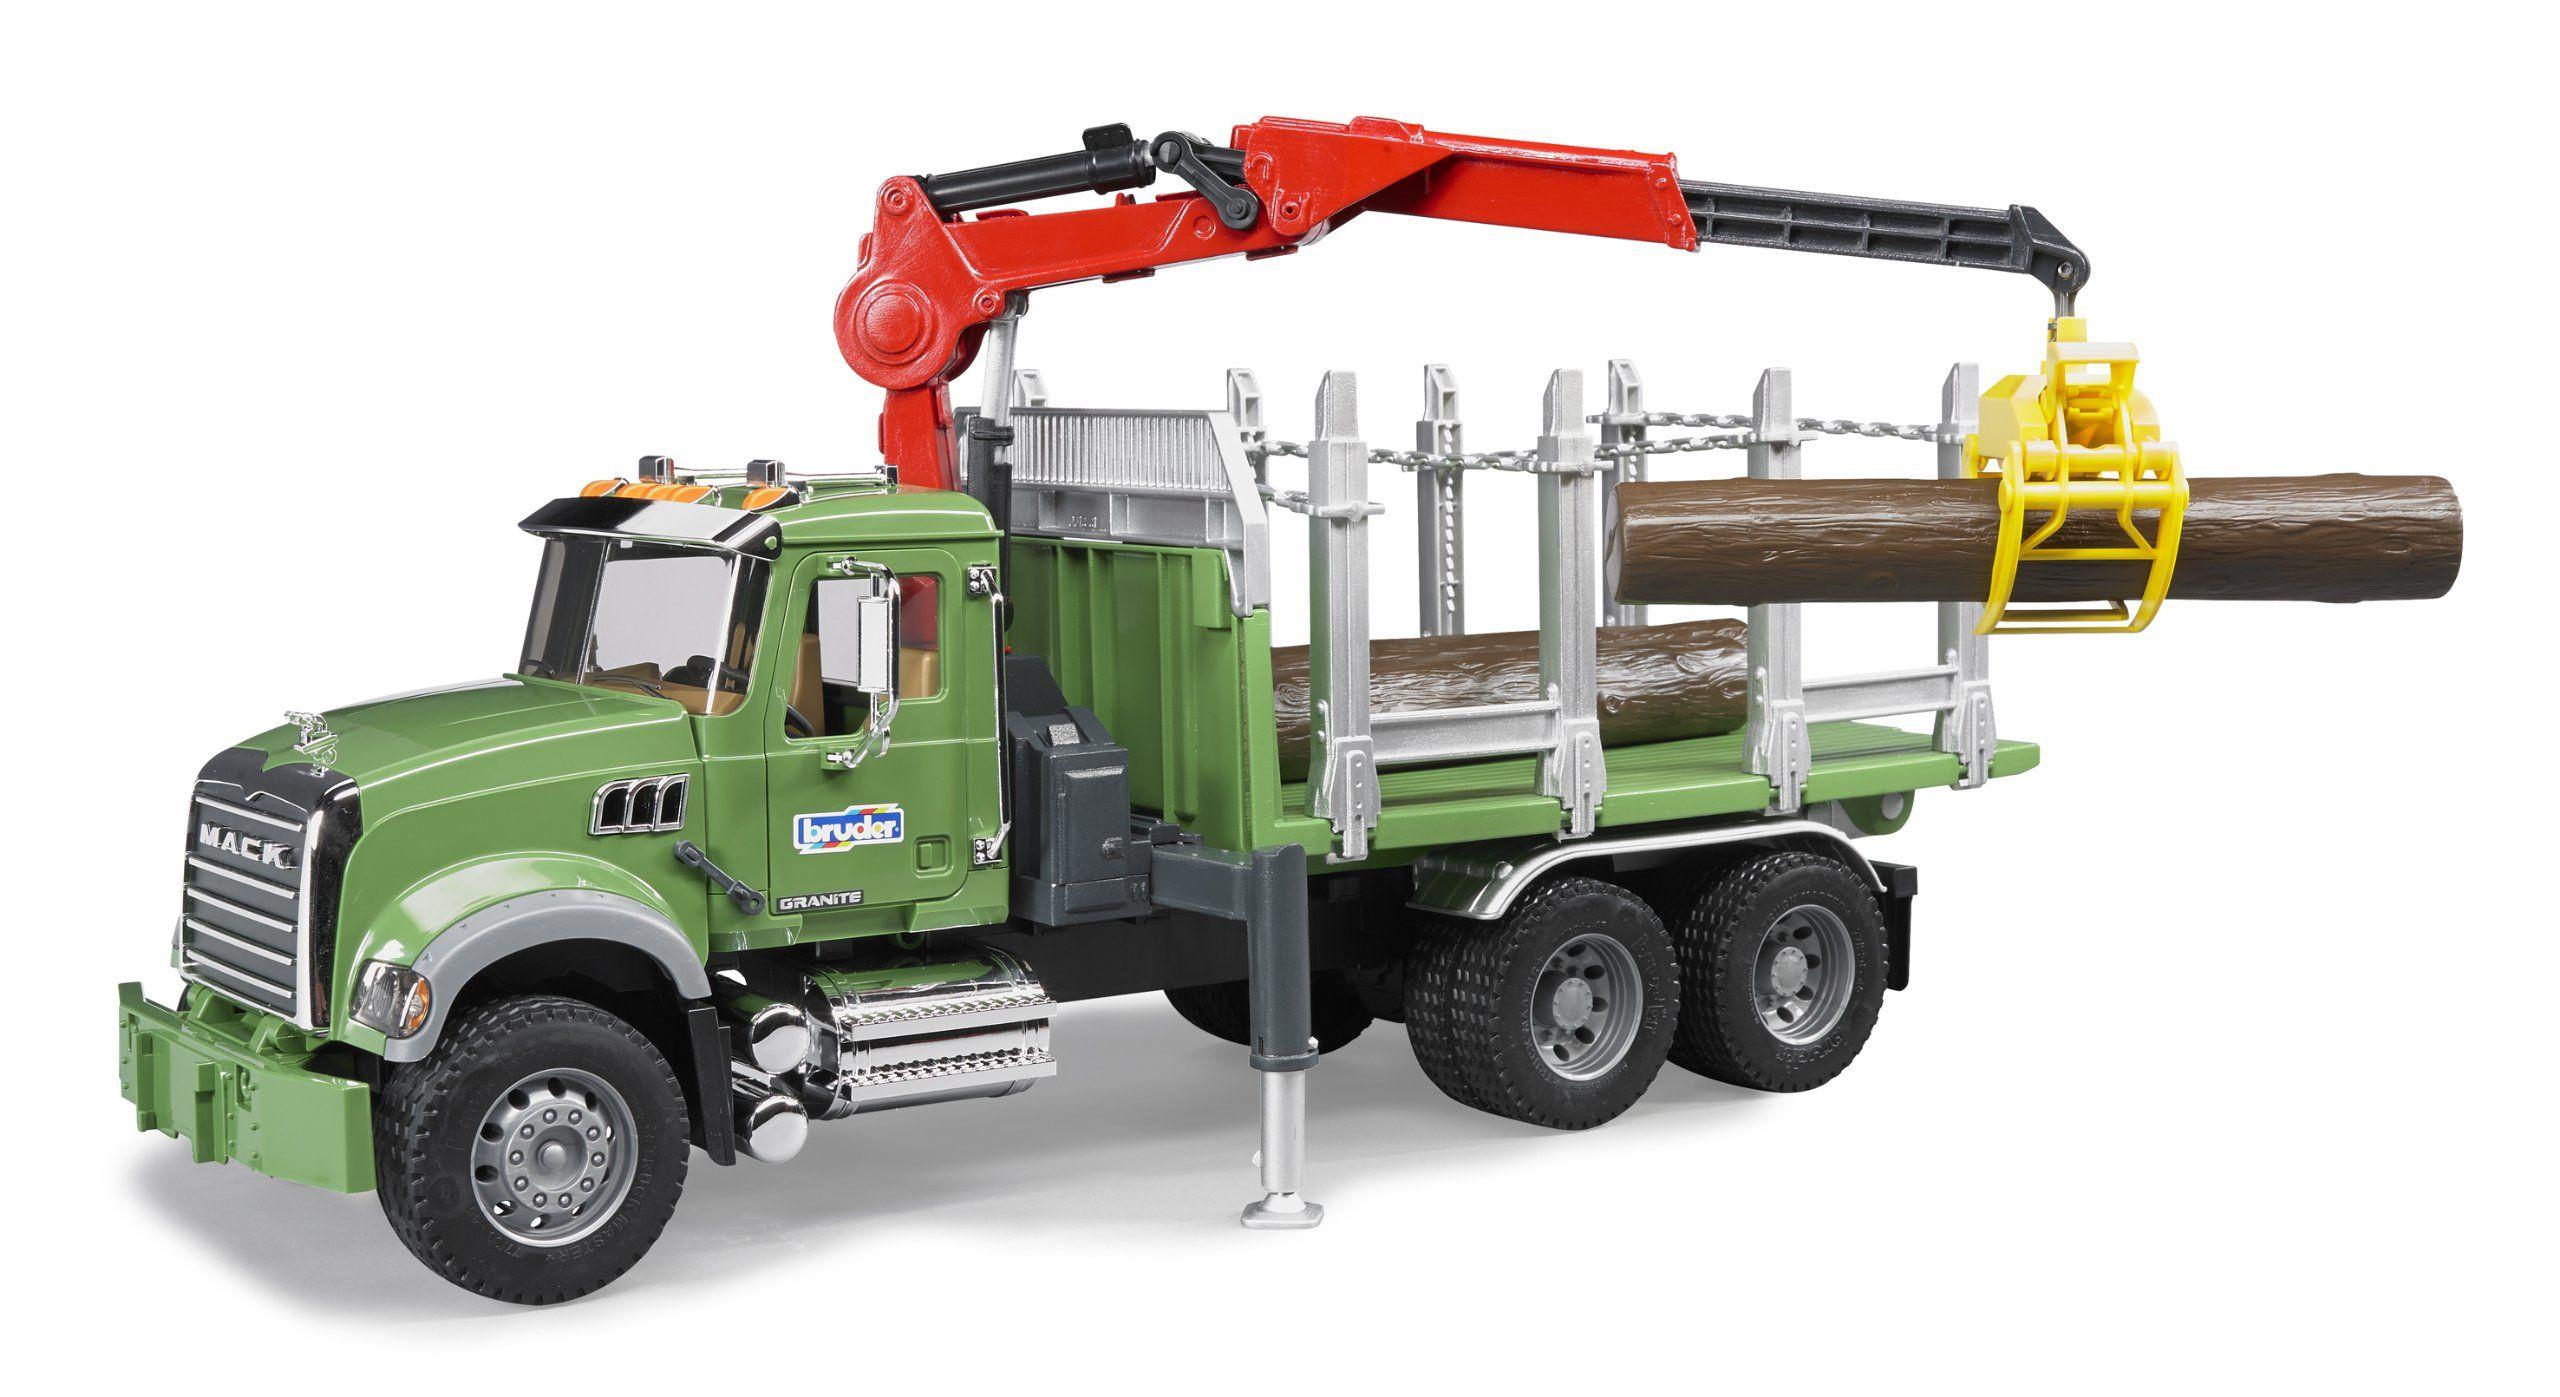 Amazon Com Bruder Mack Granite Timber Truck With Loading Crane And 3 Trunks Toys Games76 00 Trucks Toy Trucks Mack